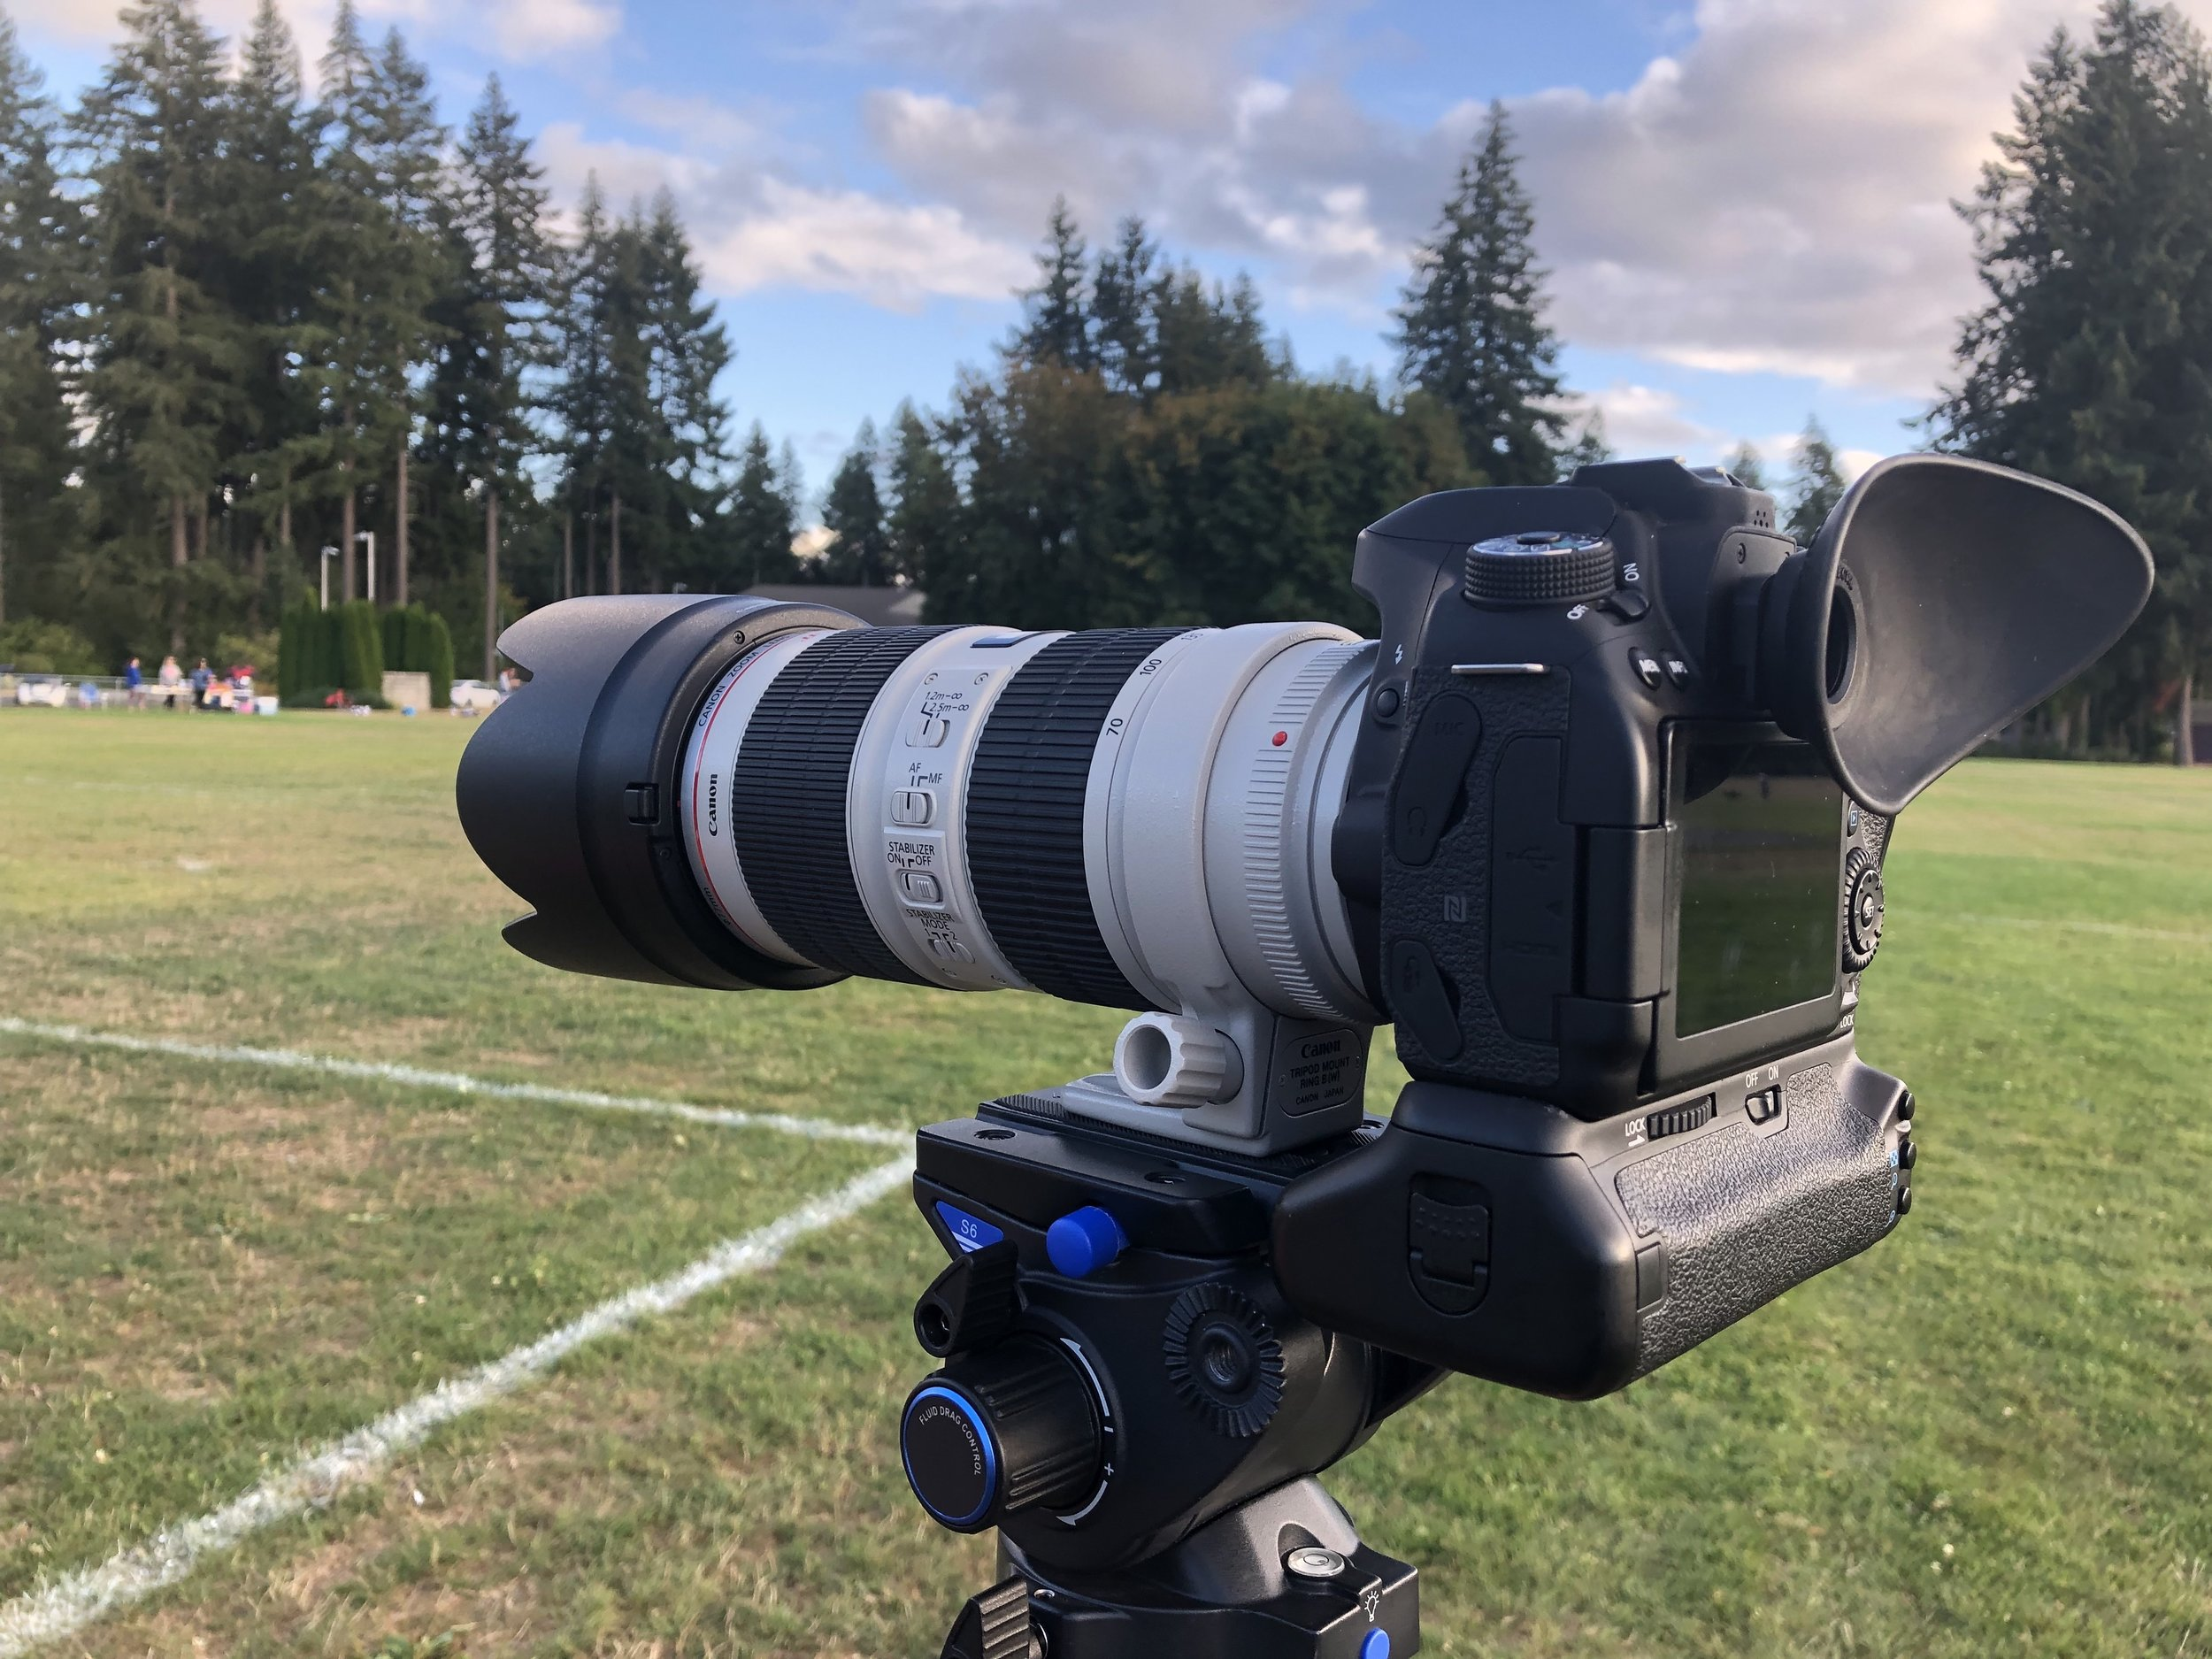 My camera, on my Benro tripod